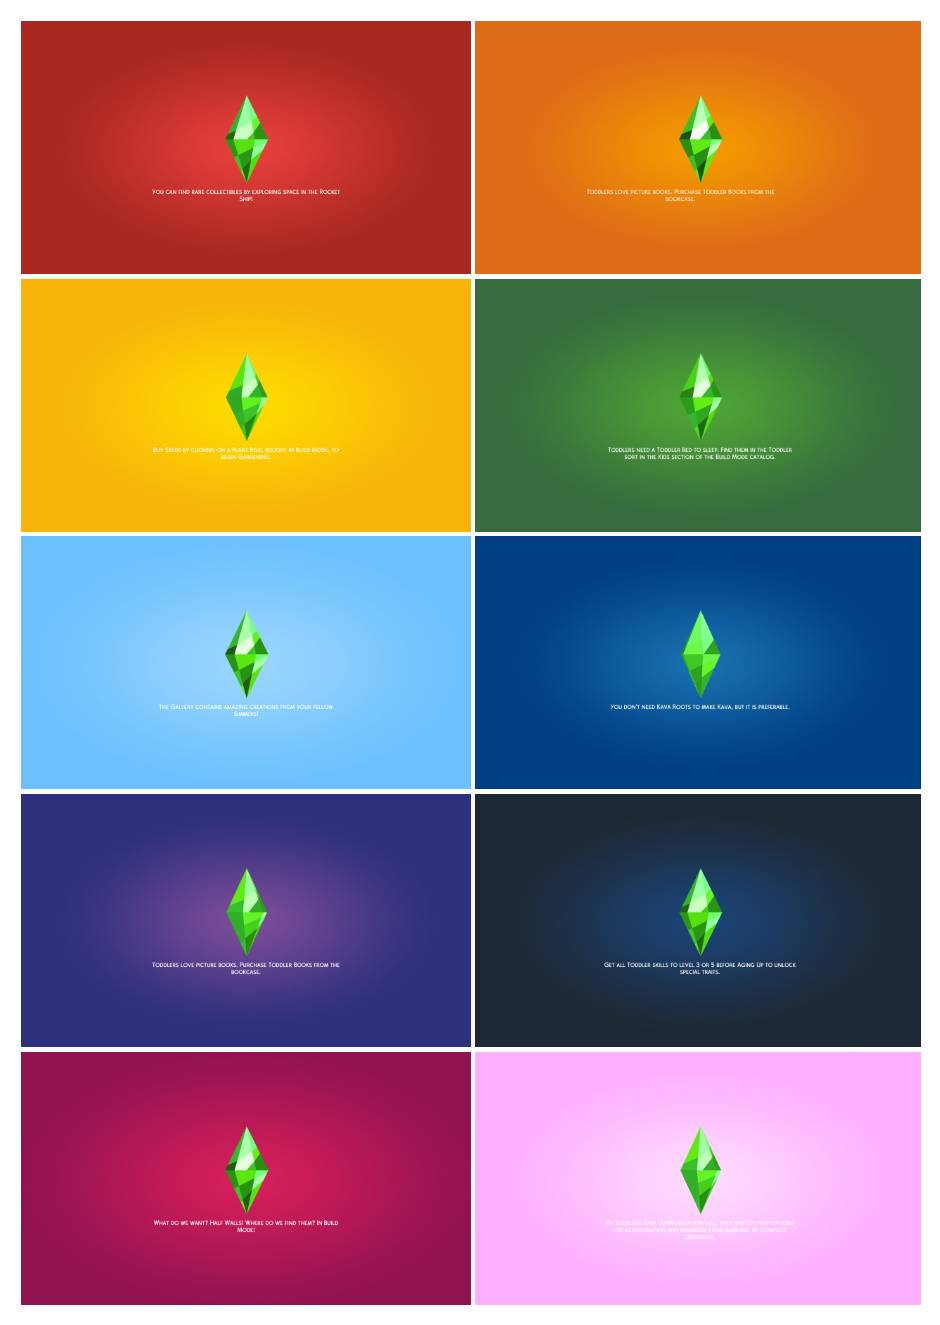 Фоны для экрана загрузки - Loading Screen Overrides